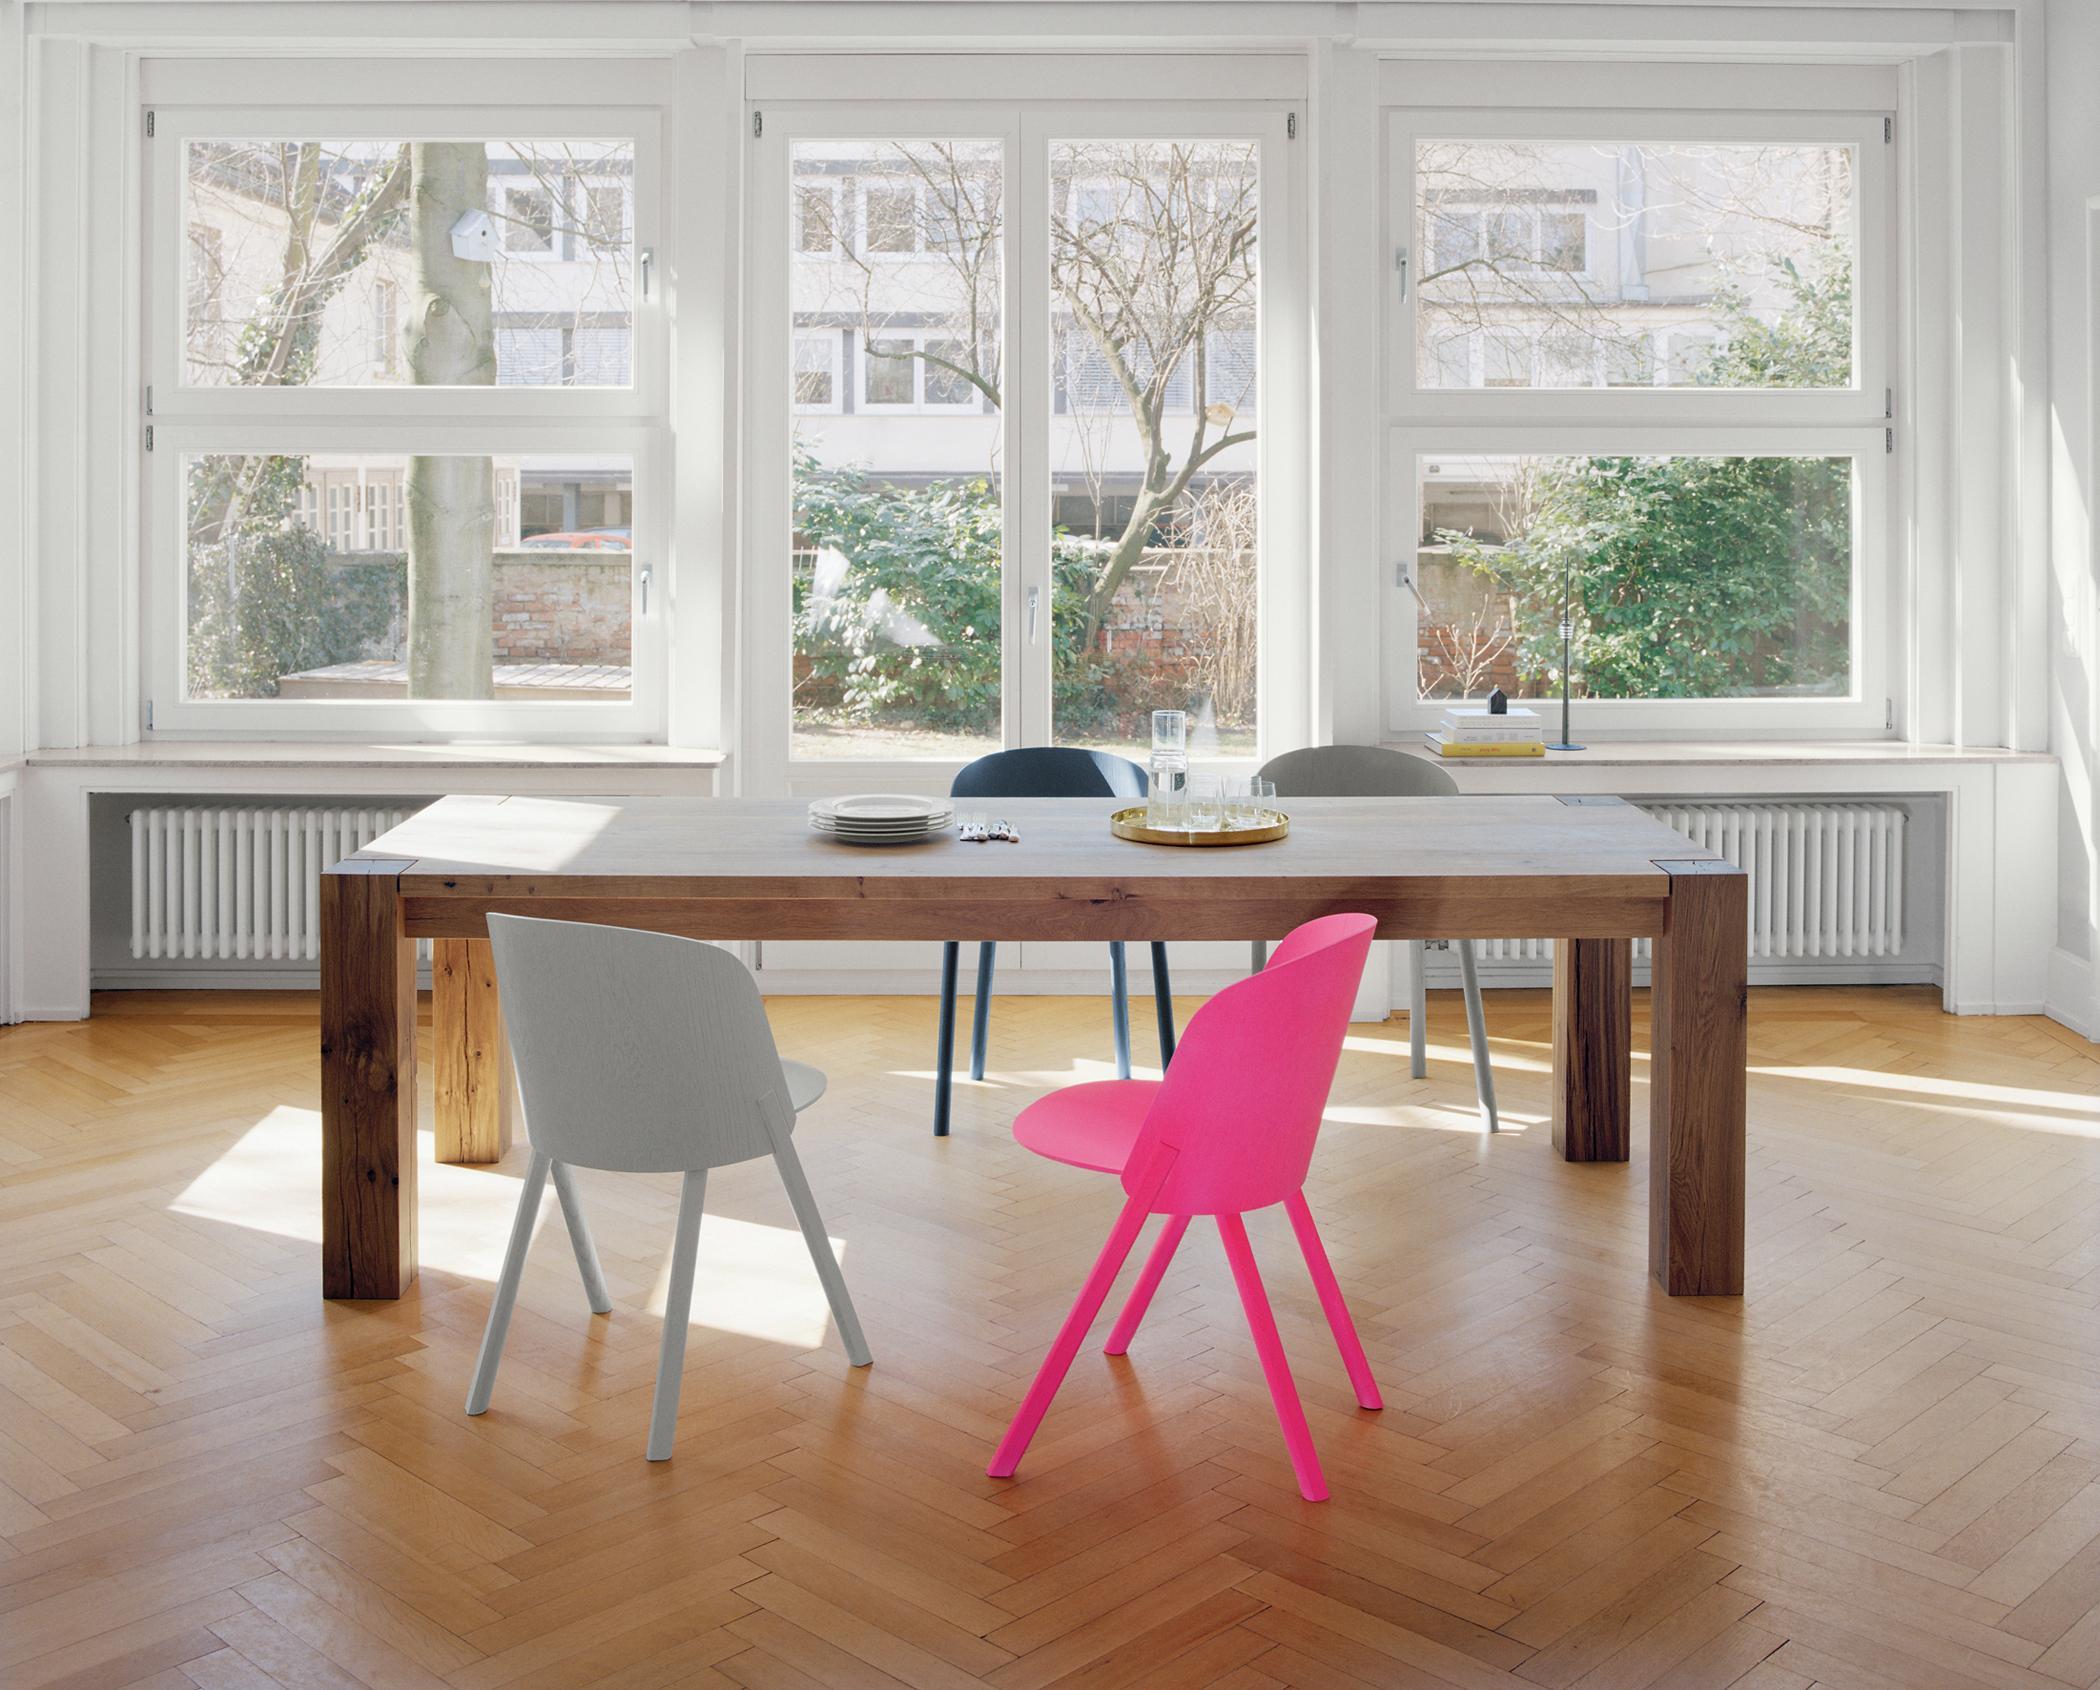 fischgr tparkett bilder ideen couch. Black Bedroom Furniture Sets. Home Design Ideas